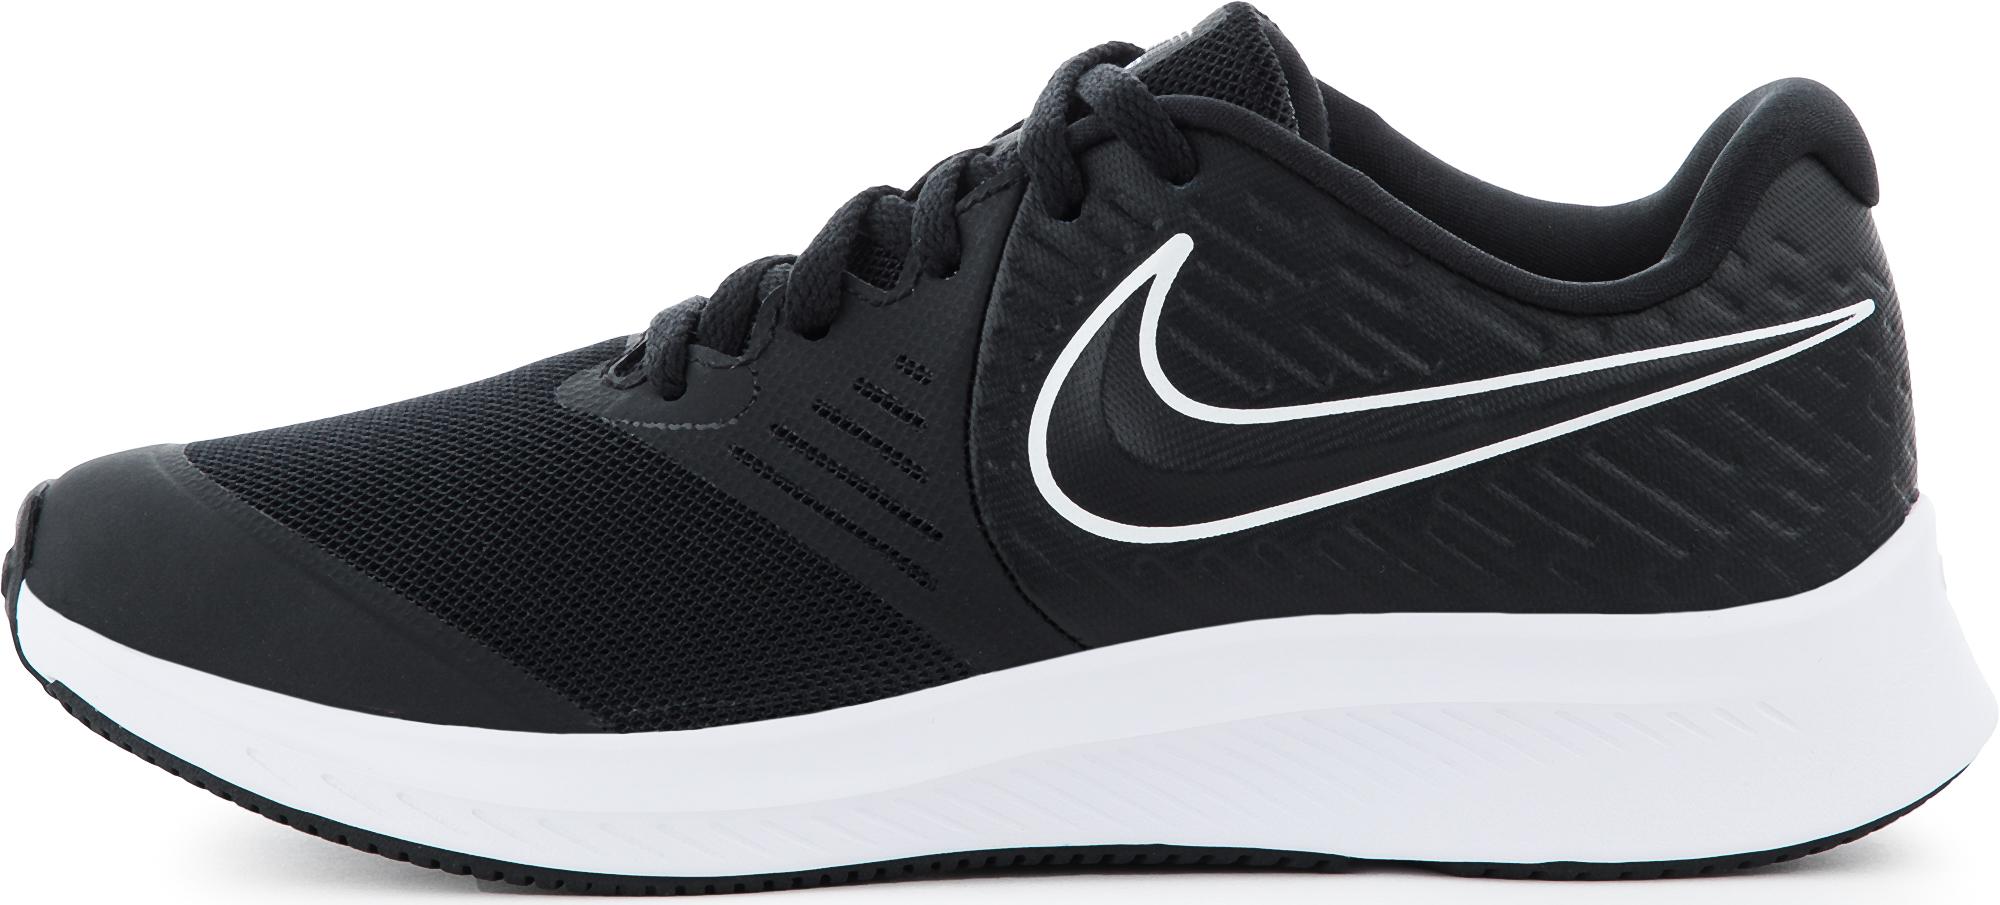 Nike Кроссовки детские Nike Star Runner 2 (Gs), размер 34,5 цена